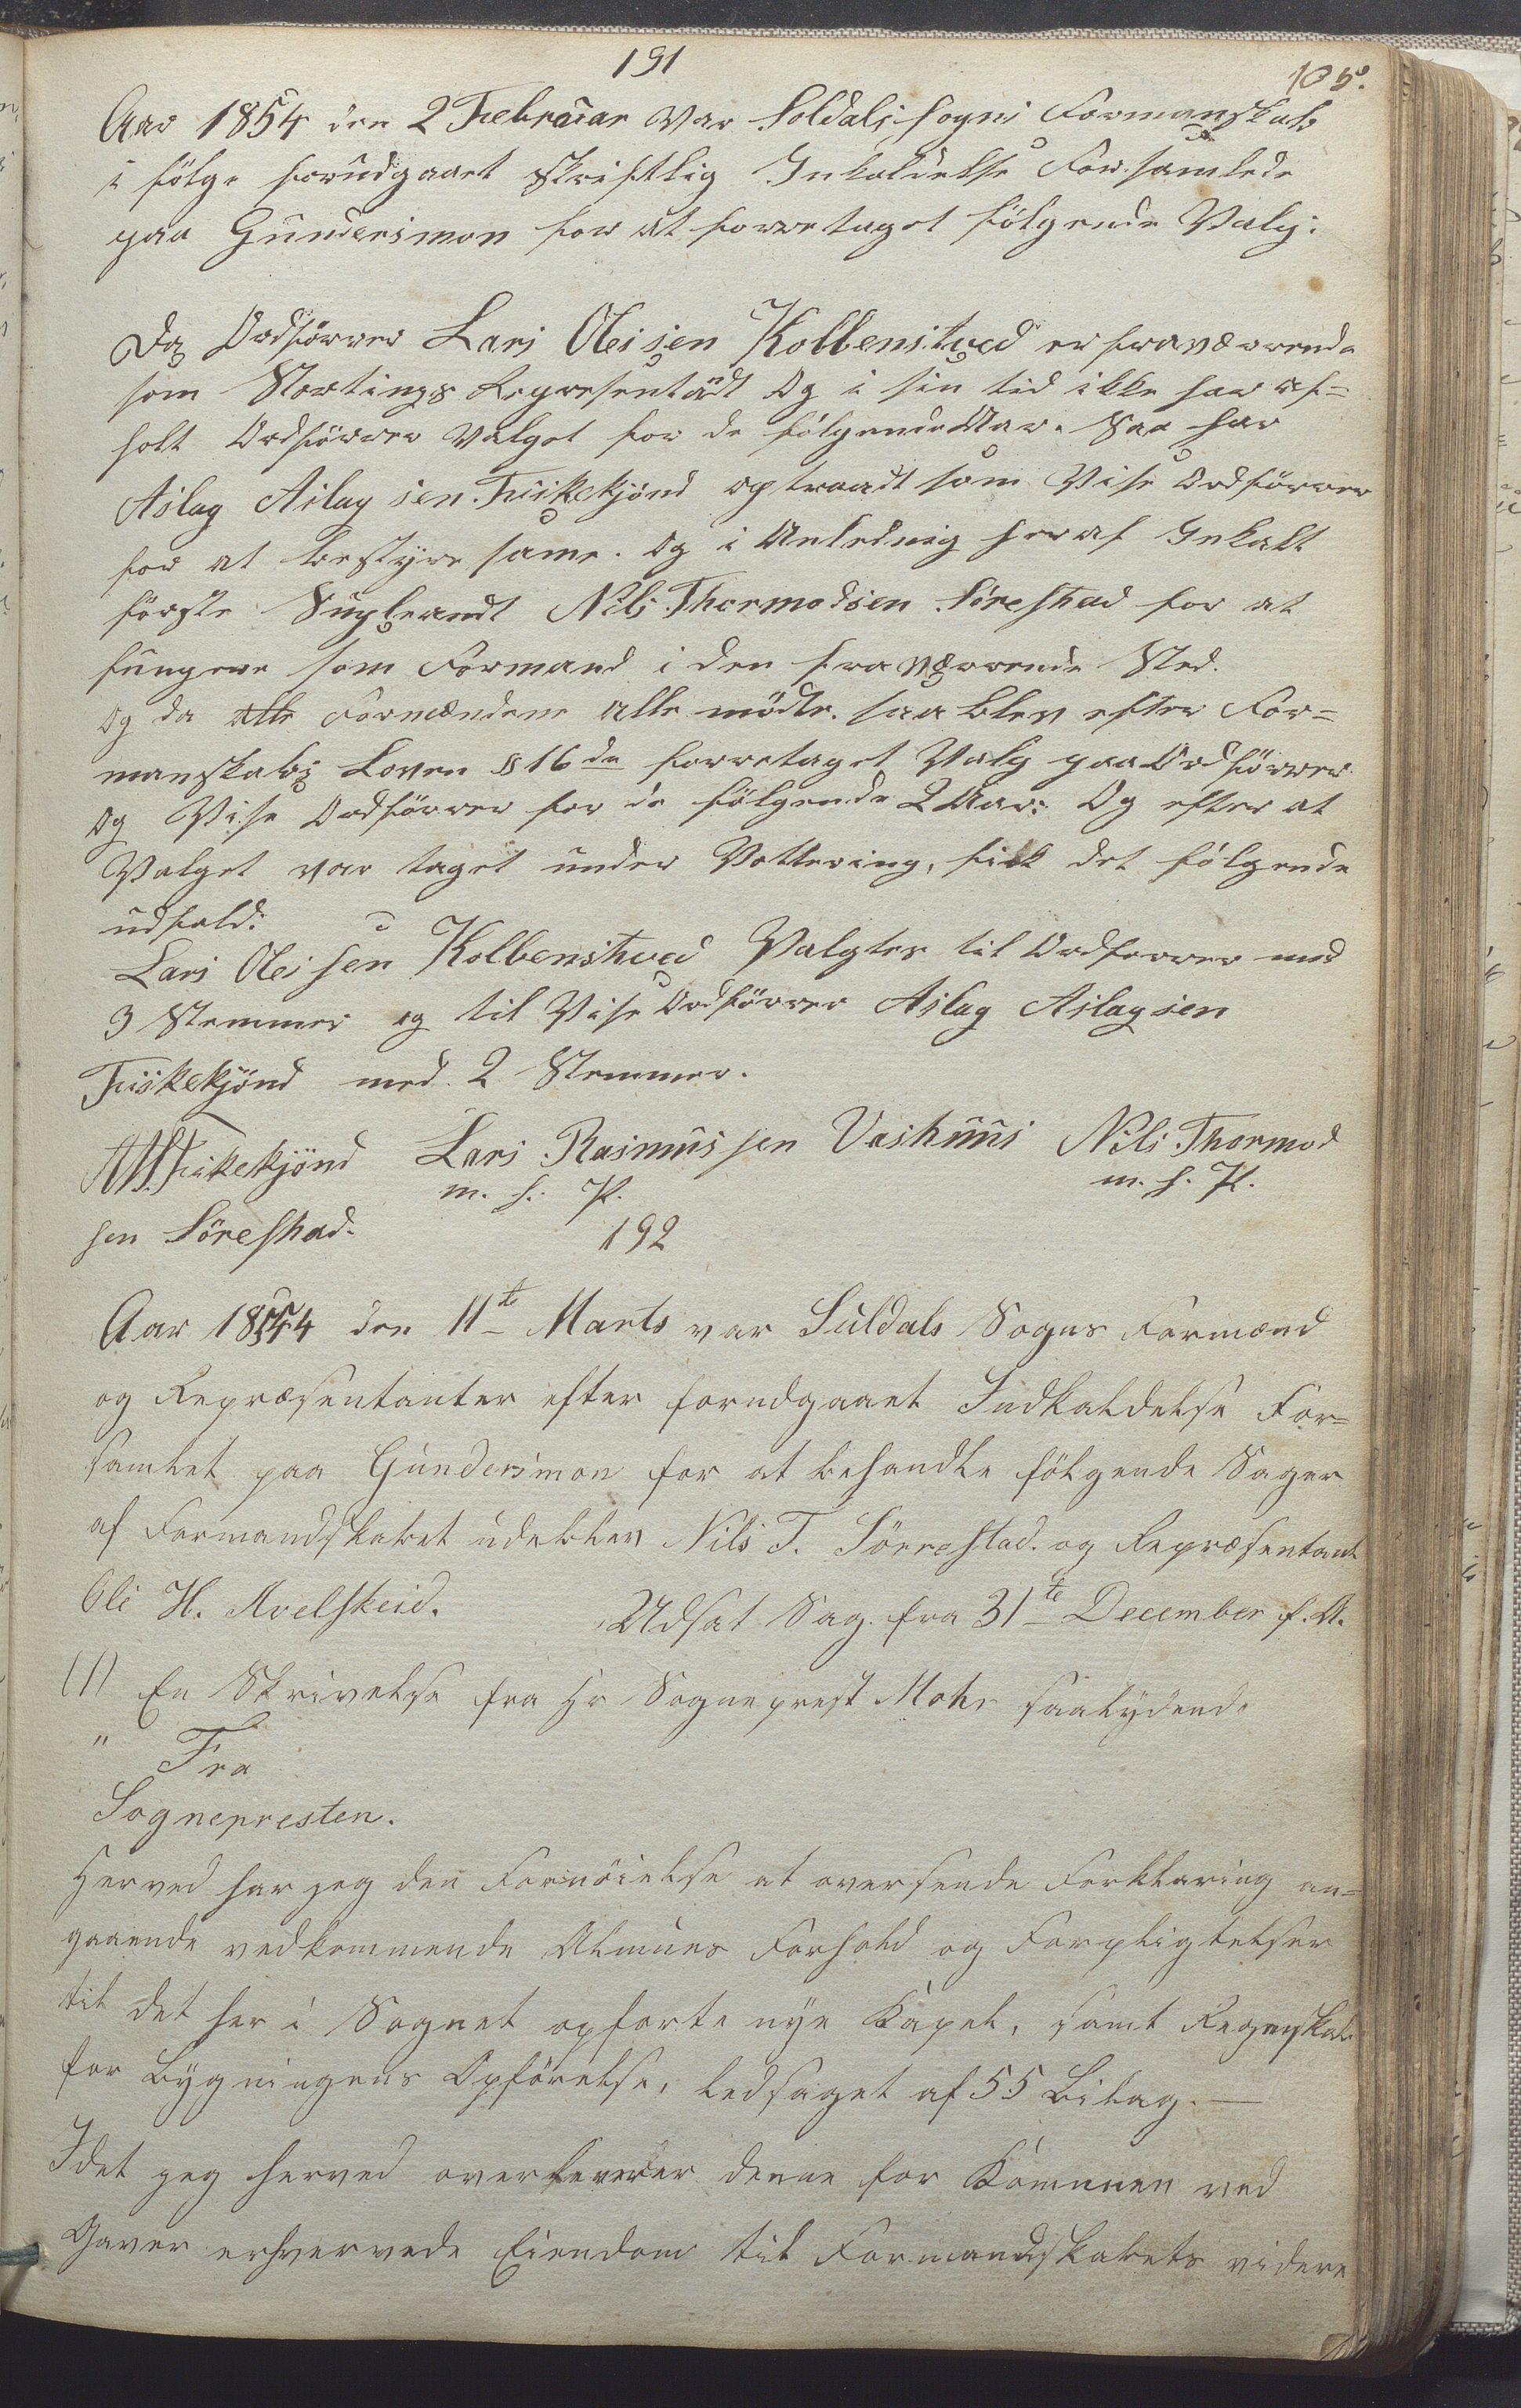 IKAR, Suldal kommune - Formannskapet/Rådmannen, A/Aa/L0001: Møtebok, 1837-1876, s. 105a